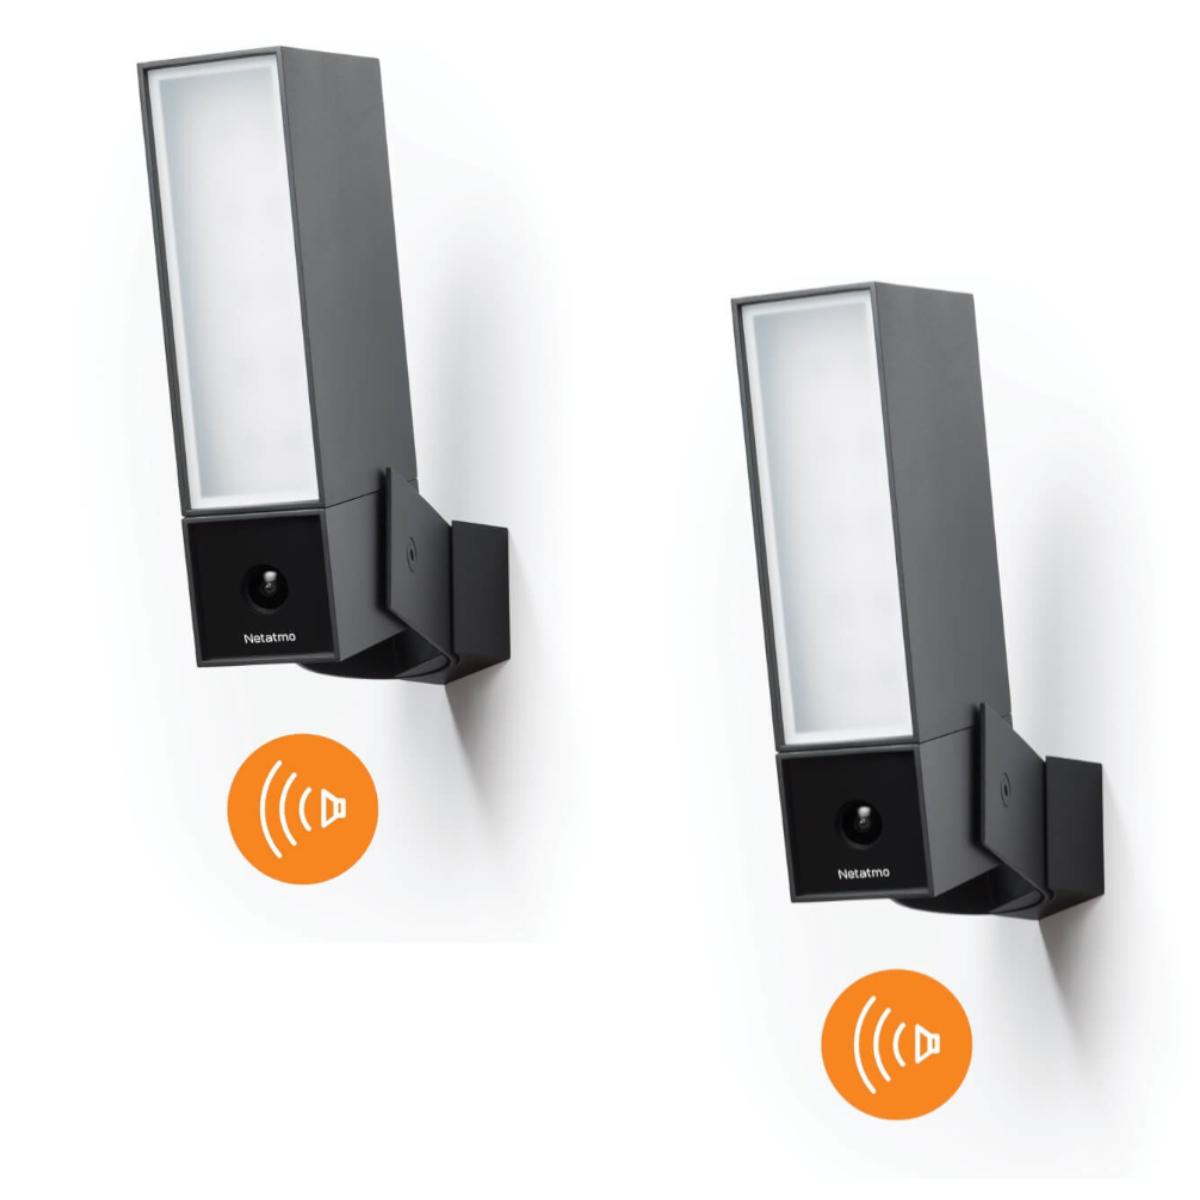 Netatmo Smarte Außenkamera mit Sirene Doppelpack - Presence Sicherheitskamera   Flutlicht 105dB Alarm